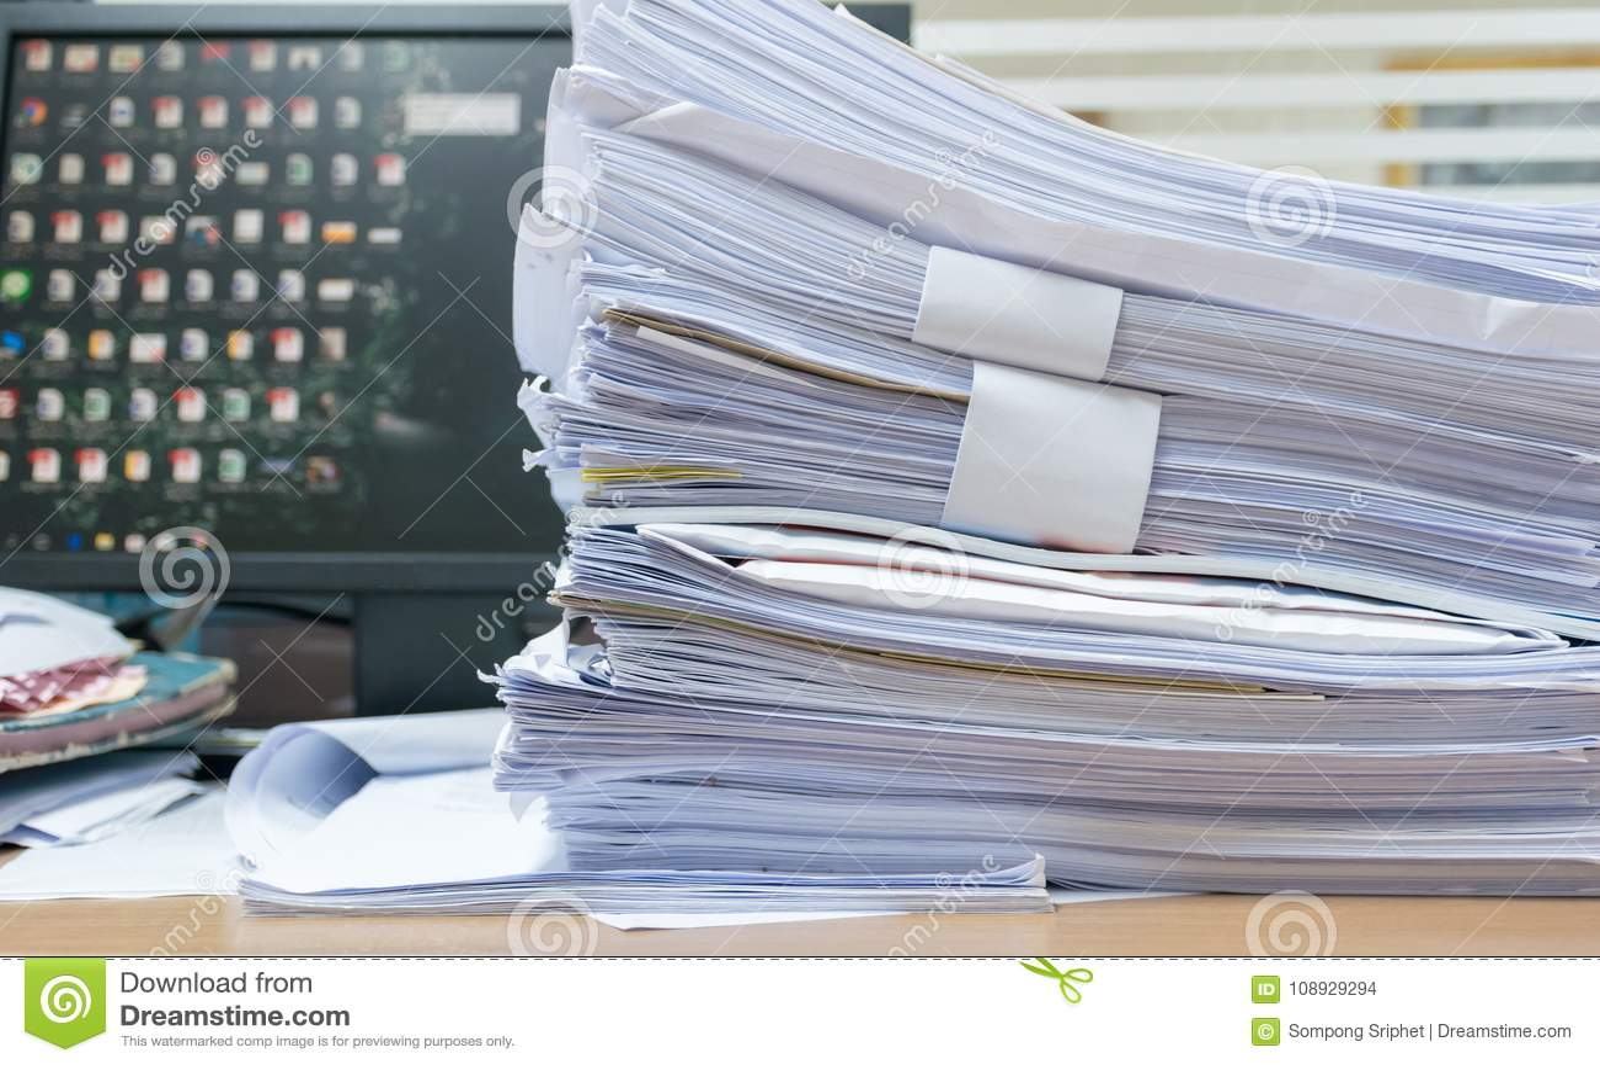 desk office file document paper. Download Comp Desk Office File Document Paper G